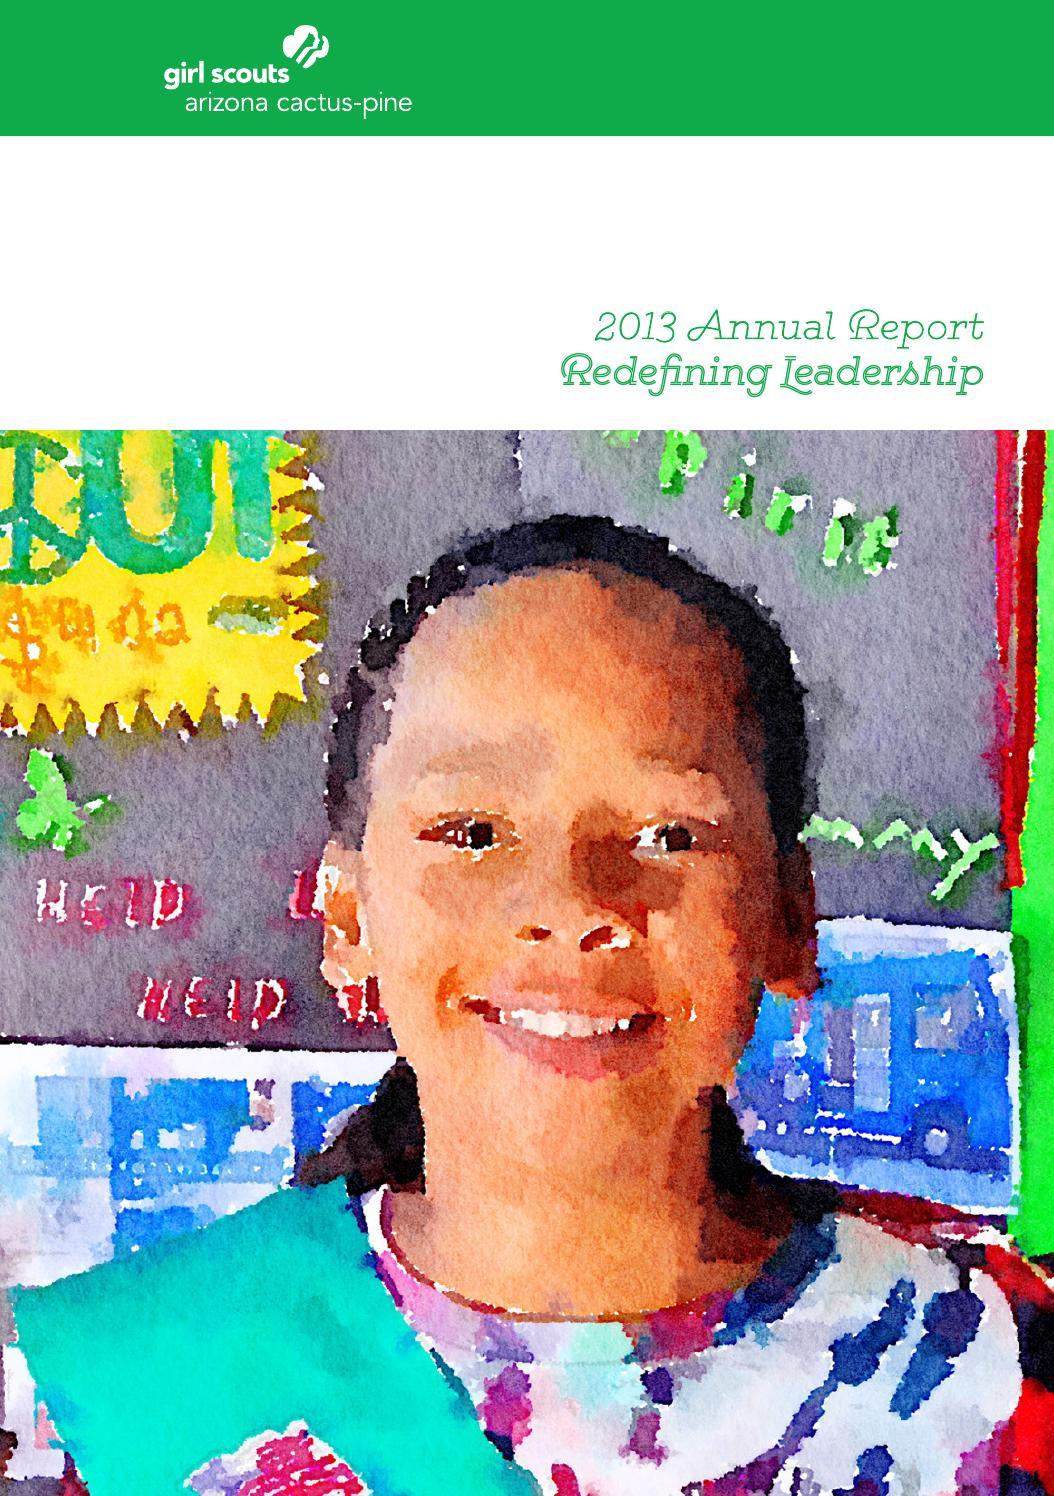 girl scouts arizona cactus pine council 2013 annual report